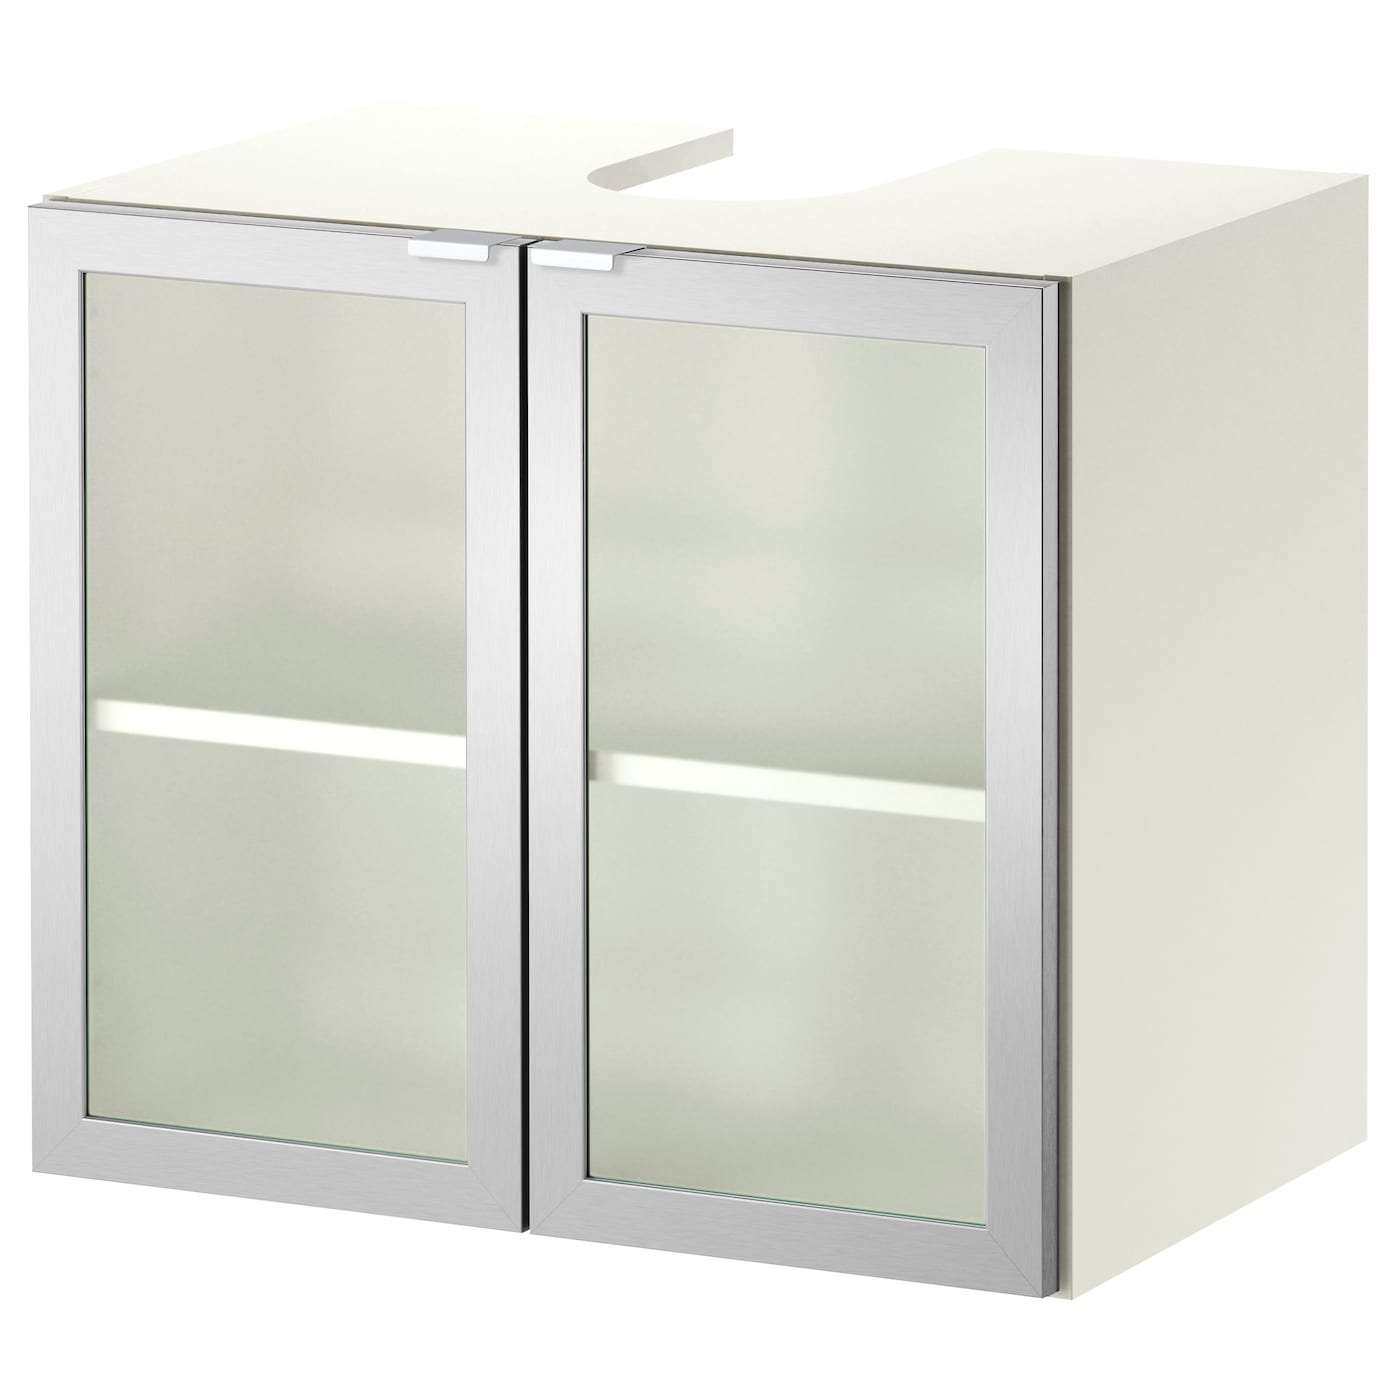 Lill Ngen L Ment Bas Lavabo 2 Portes Blanc Aluminium 60 X 38 X 51